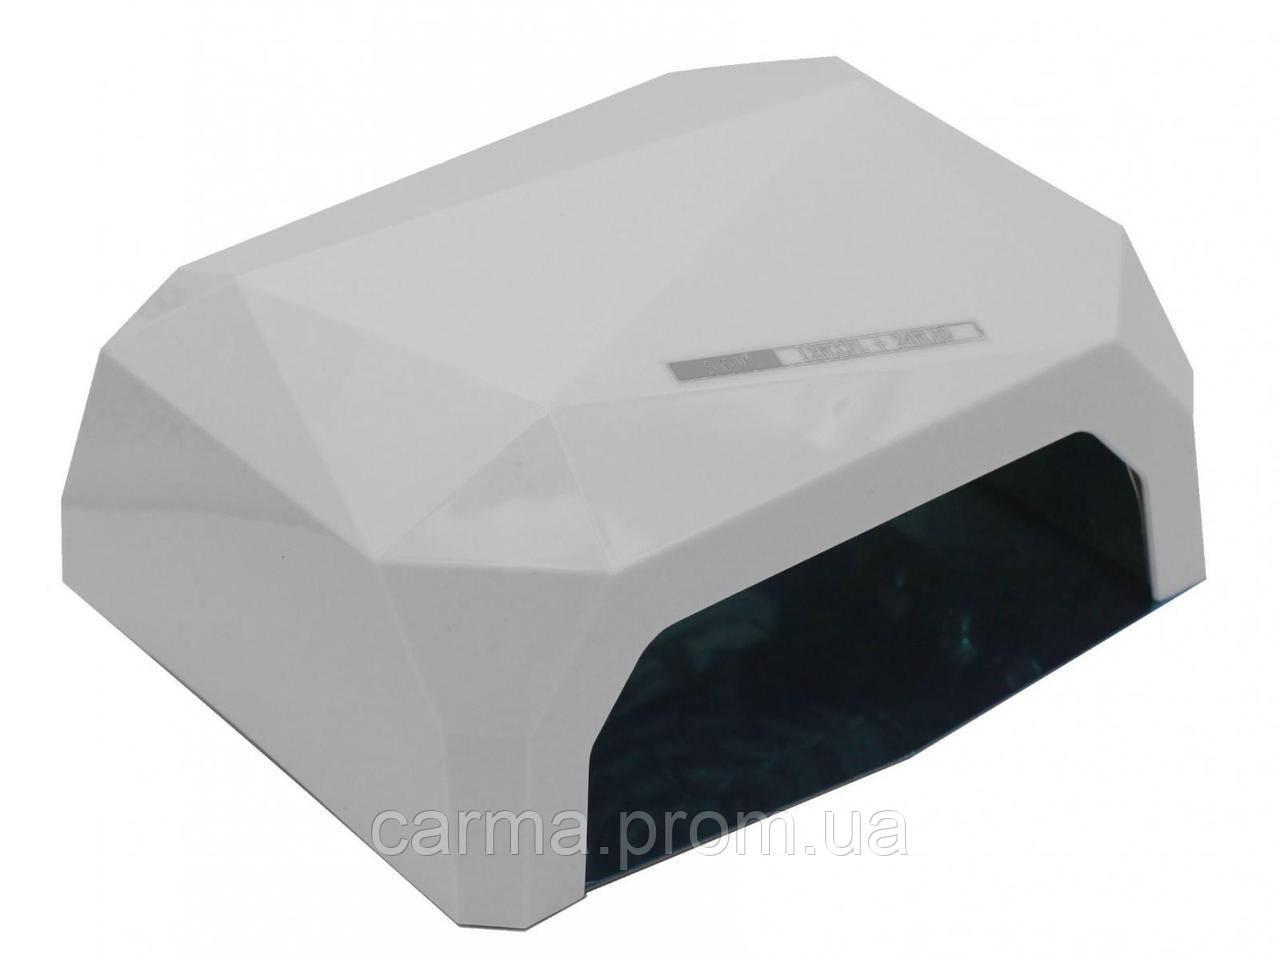 Лампа для маникюра гибридная DIAMOND CCFL+LED 36W Белая